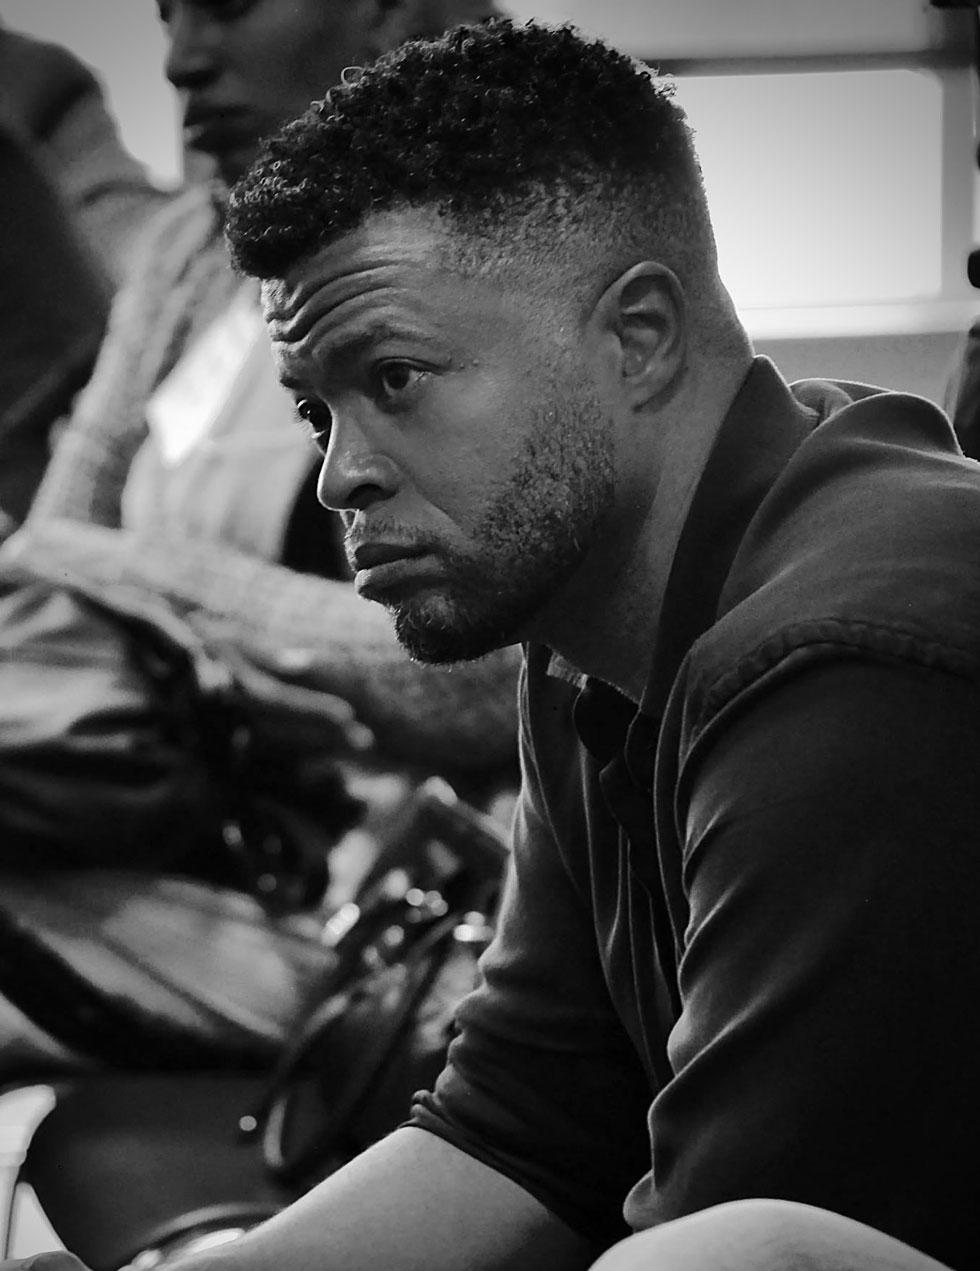 HENRI PARDO - Founder and President of Black Wealth MediaContent Developer and Lead FilmmakerCreator of popular series « Black Wealth Matters »